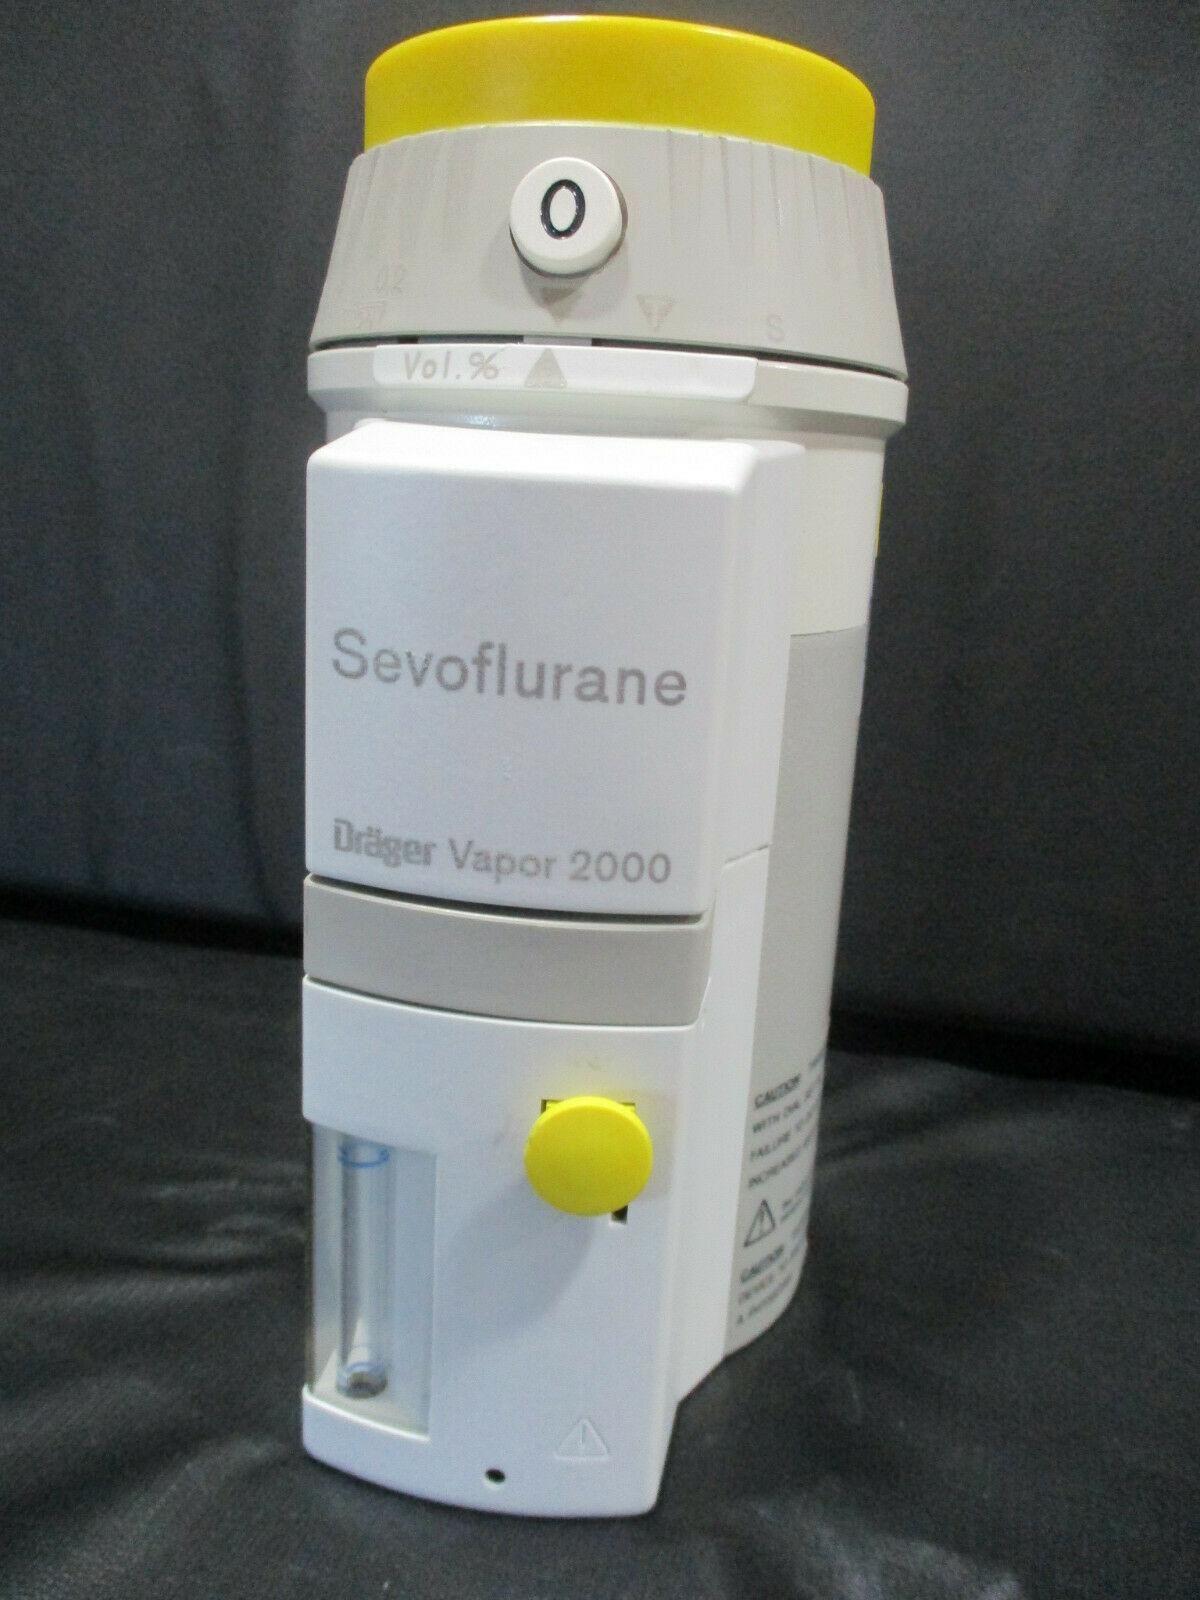 Drager Sevoflurane Vapor 2000 Vaporizer and Key - REFURBISHED - 90 DAY WARRANTY